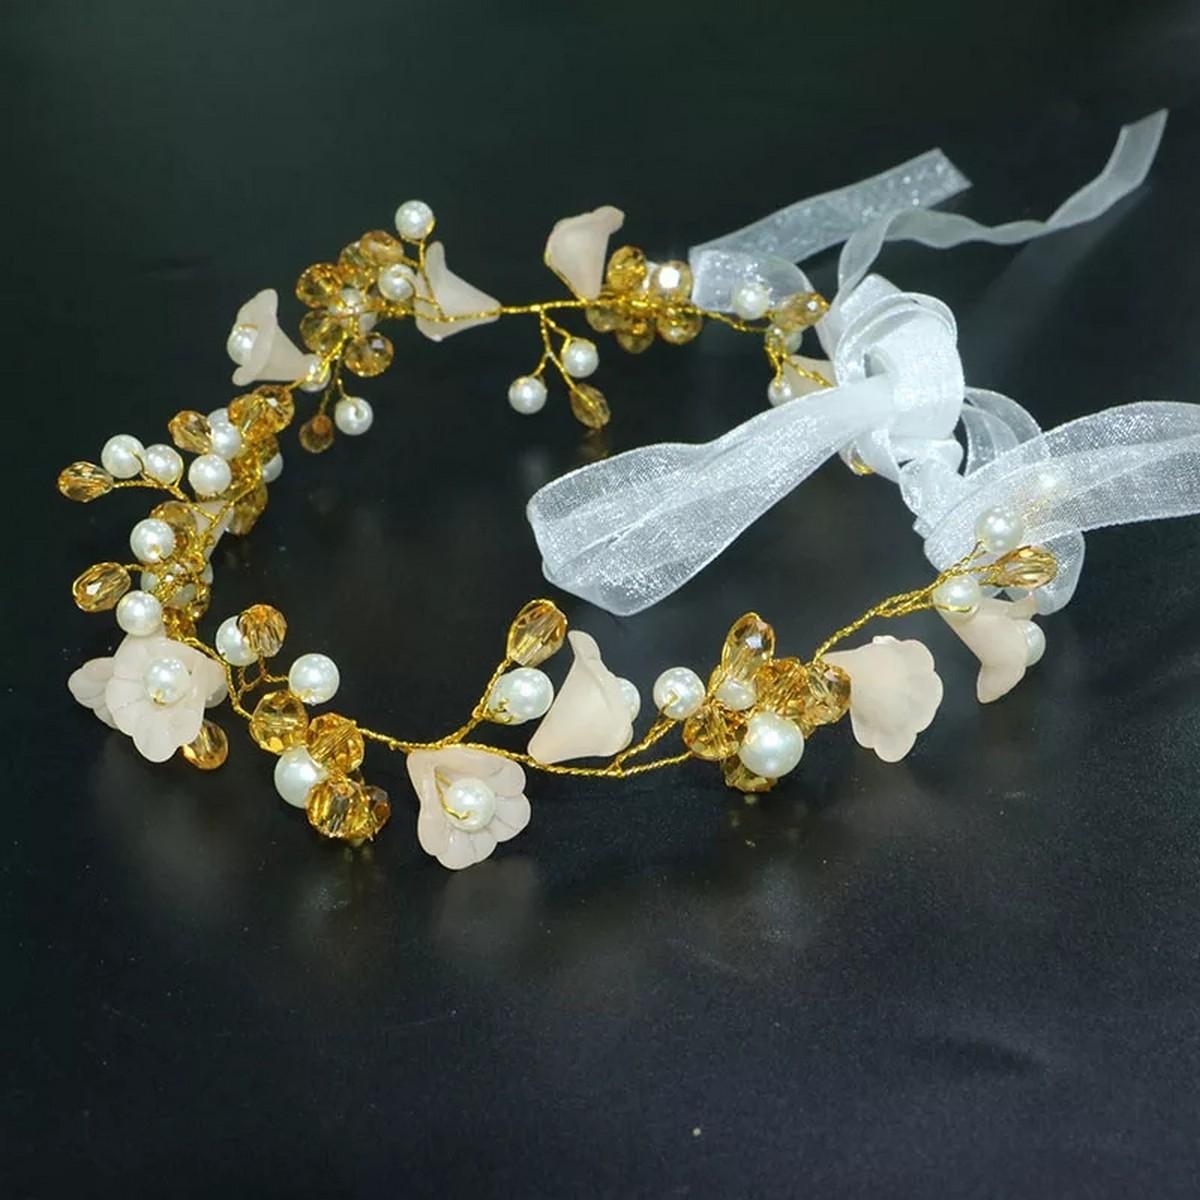 Elegant Bridal Wedding Hair Accessories Crystal Pearl Flower Girl Headband Ribbon Headpiece Hair Jewelry Accessories 4 colors